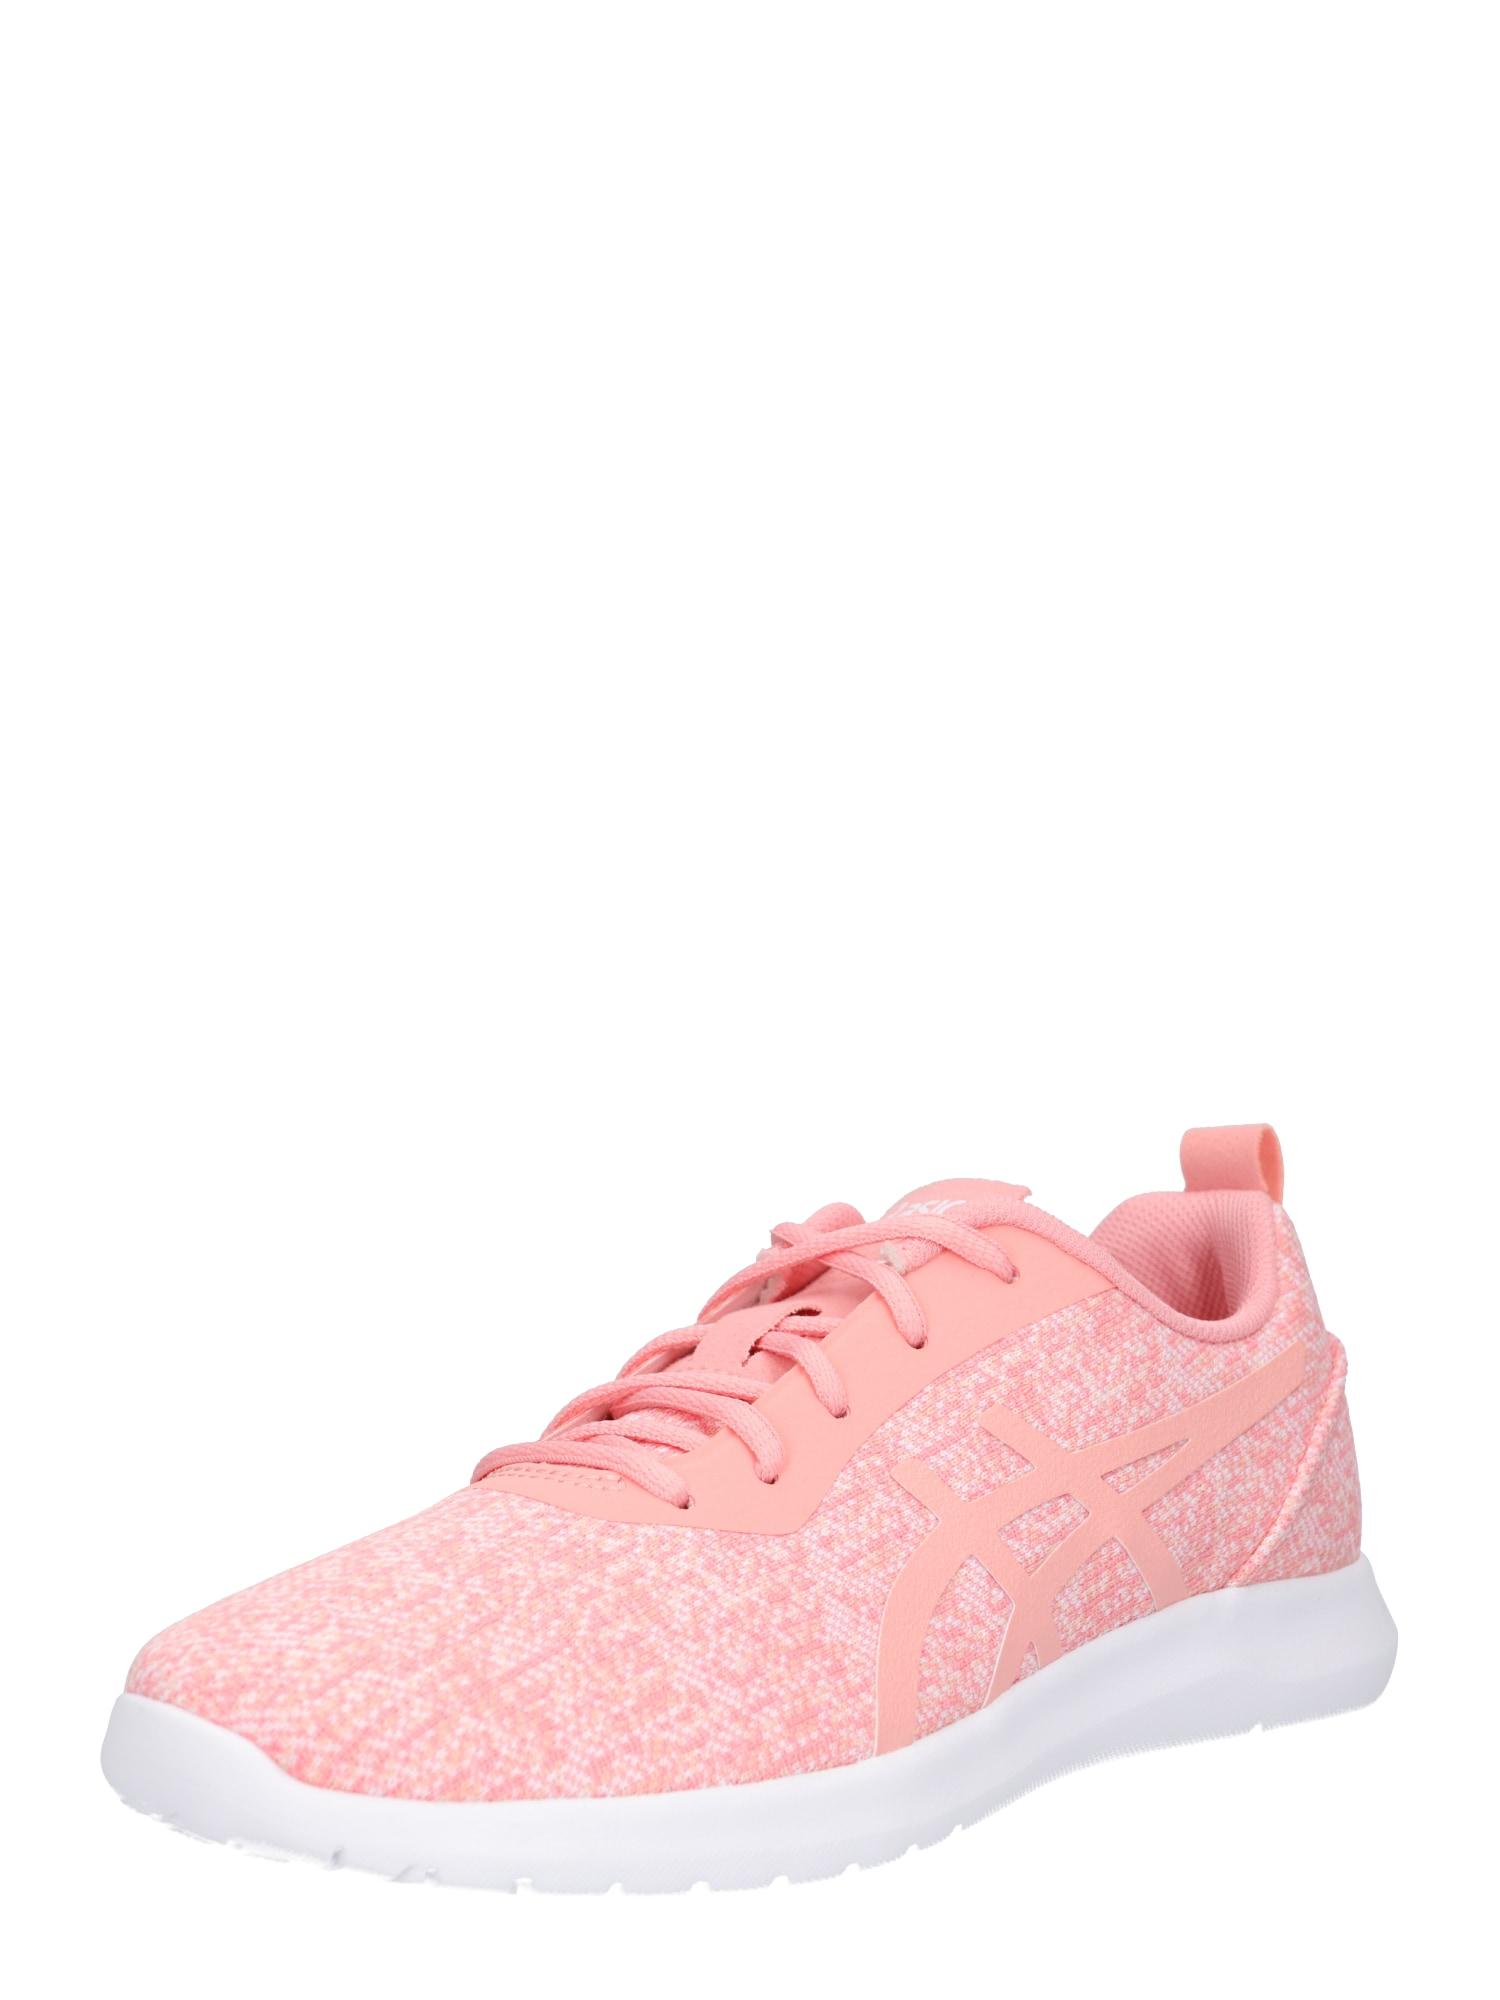 Běžecká obuv Kanmei 2 růžová ASICS